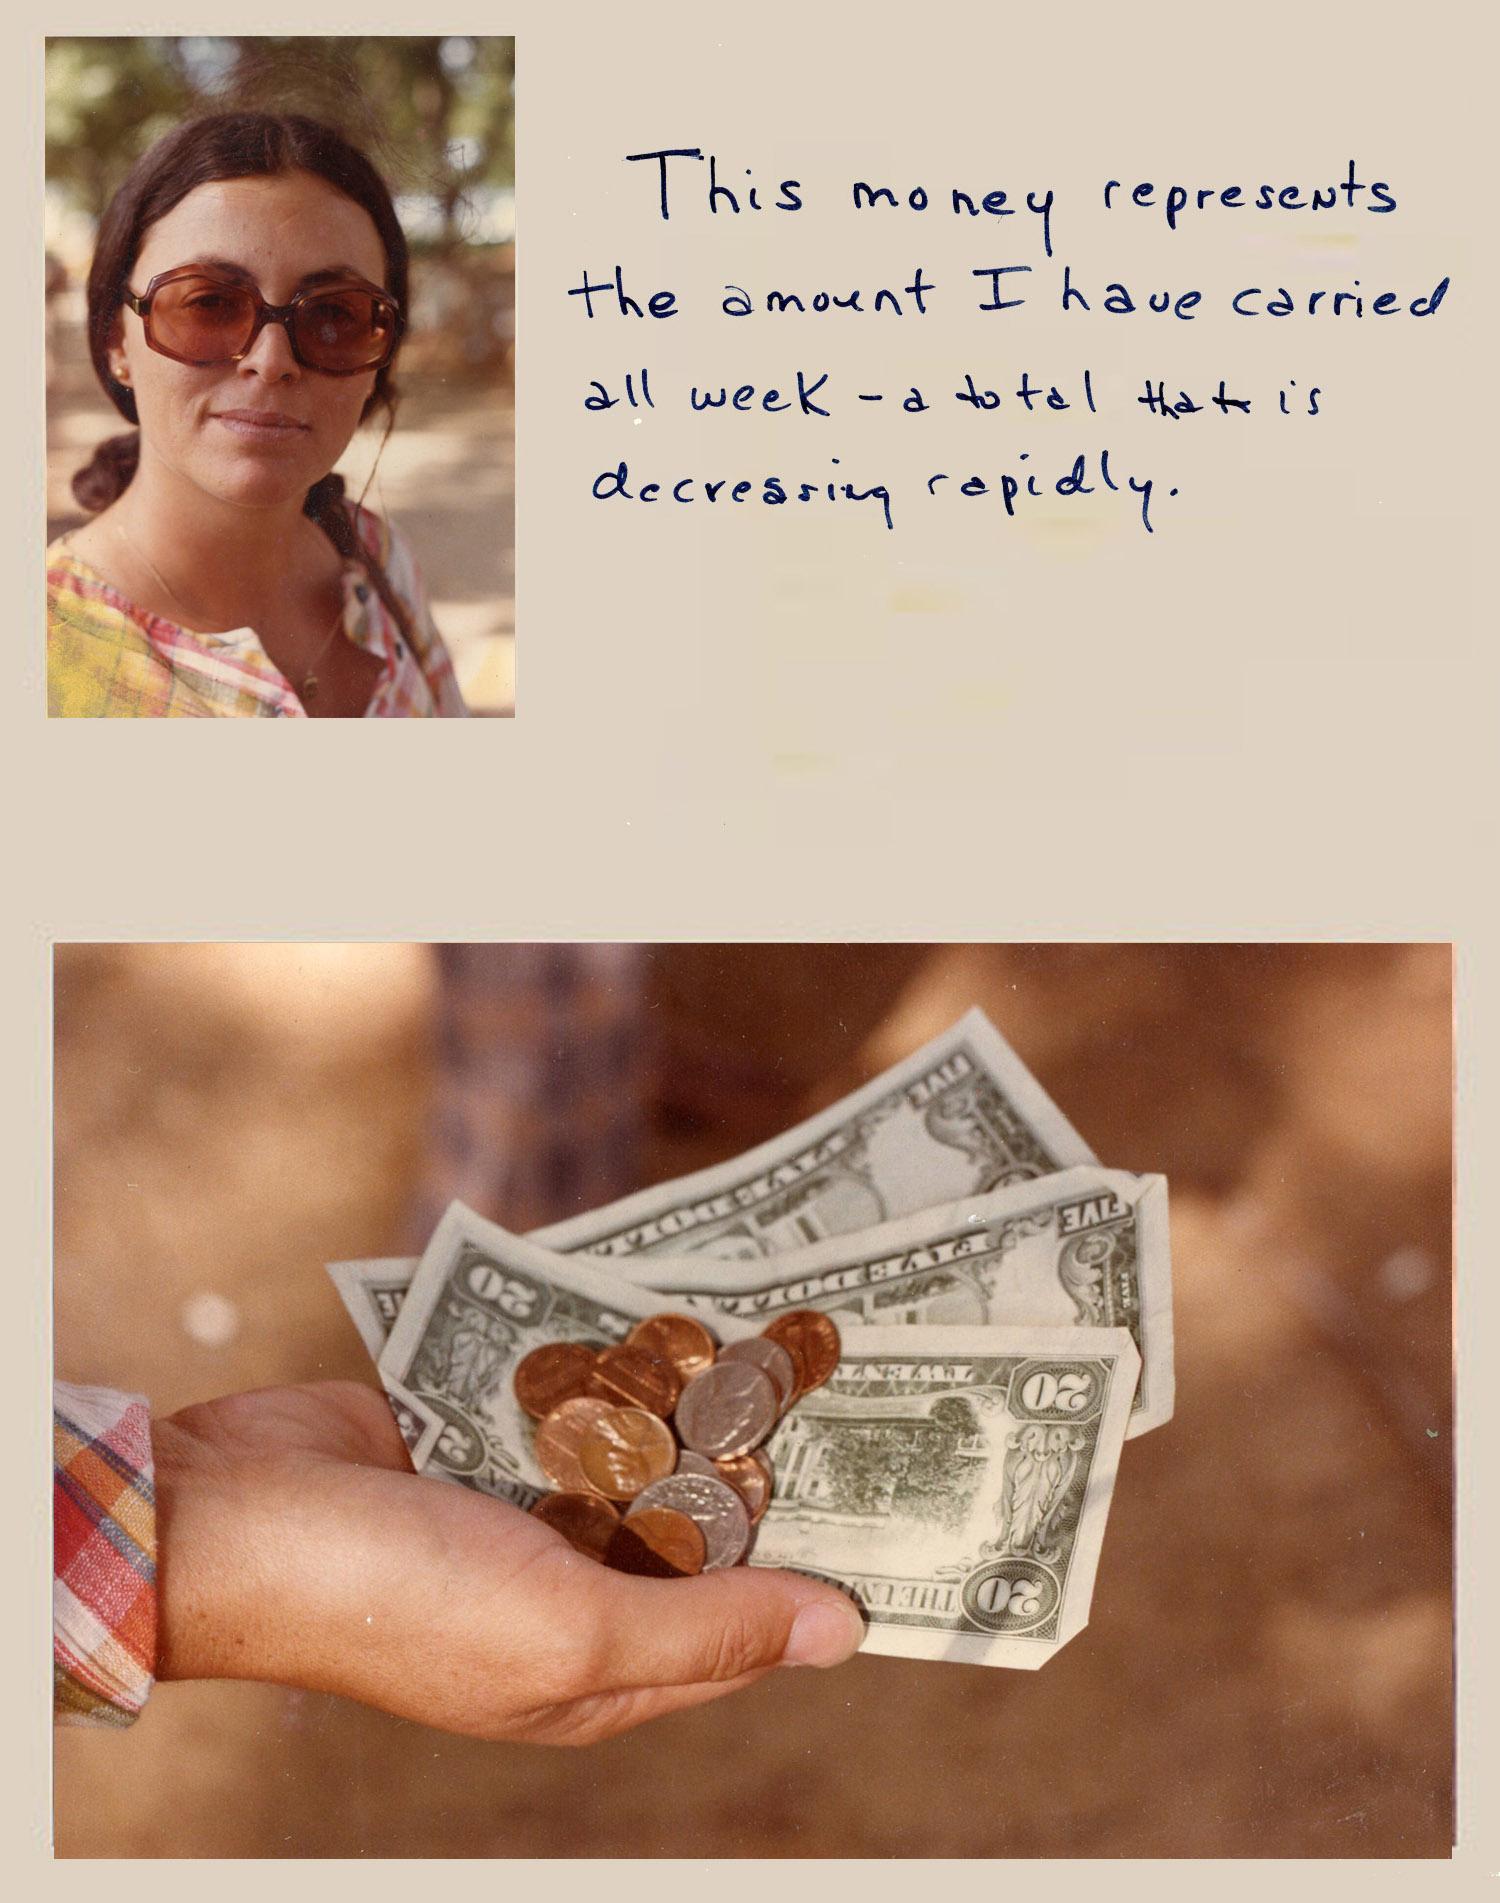 money-redesign-5 copy.jpg